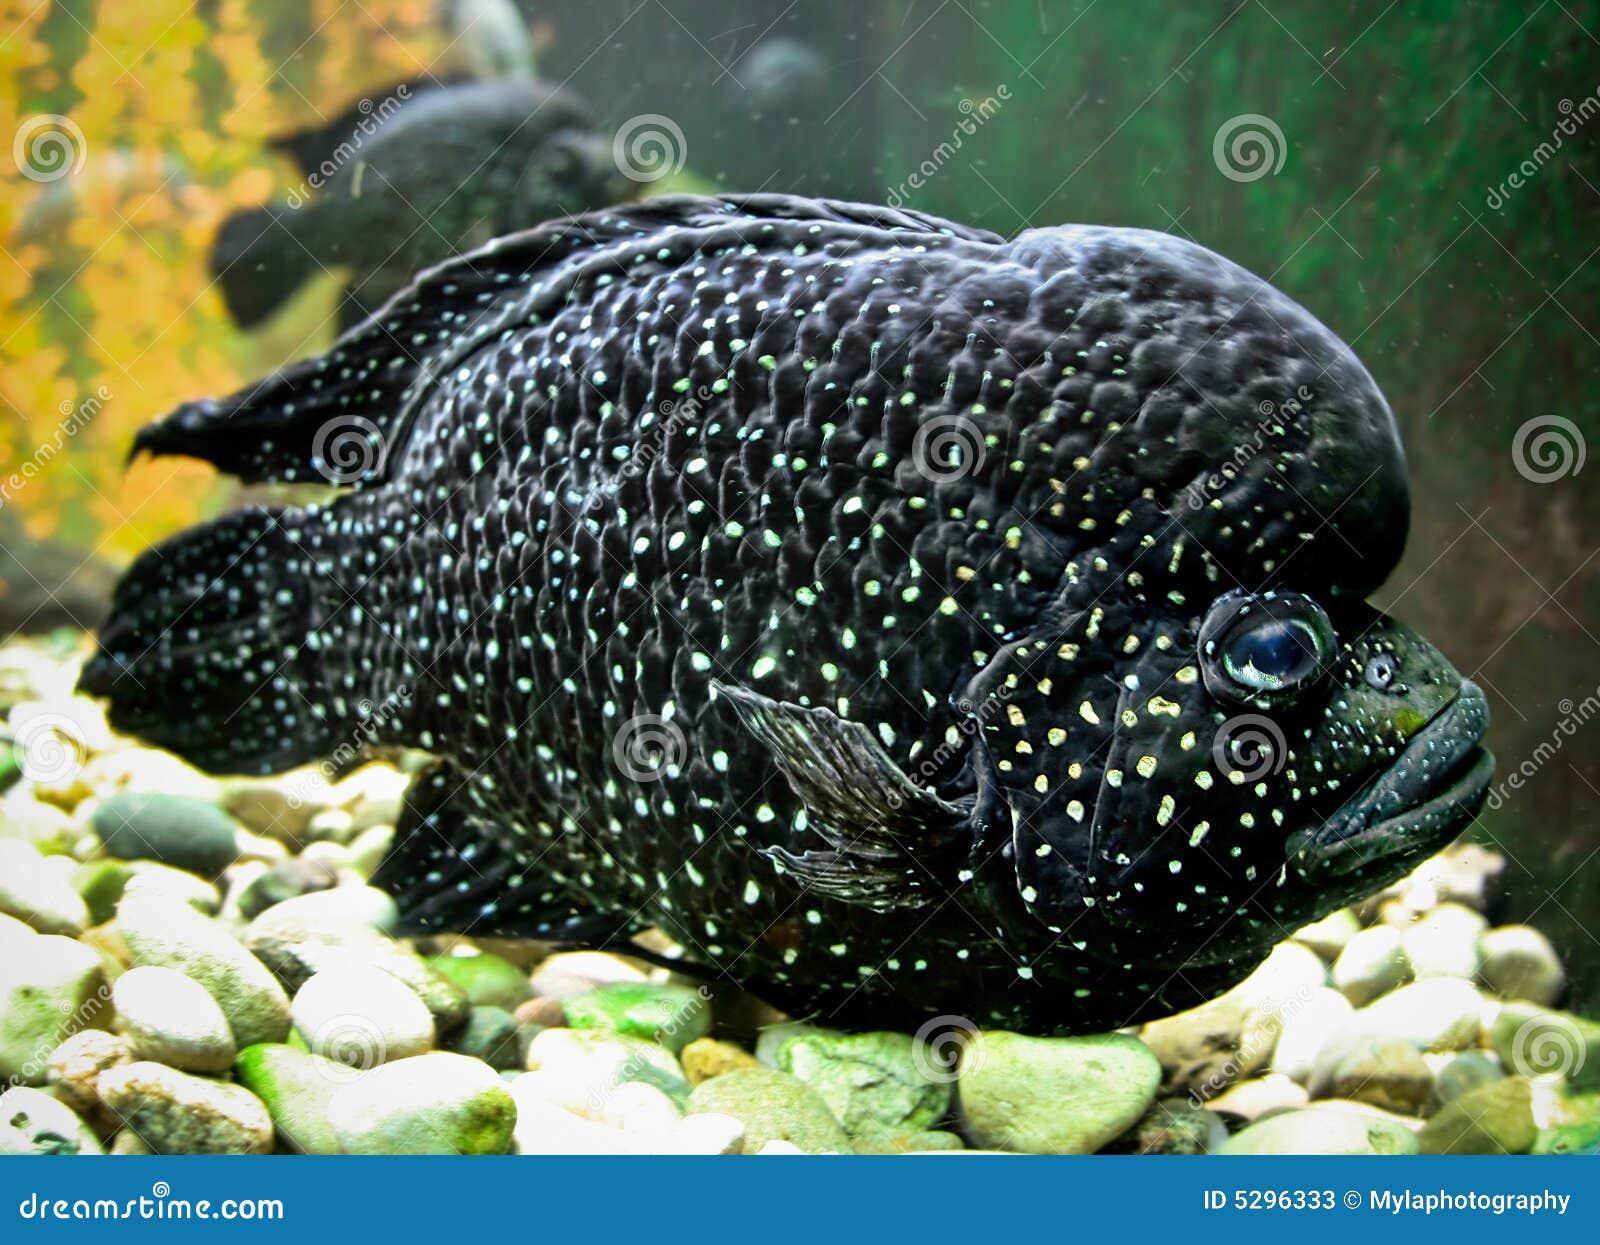 giant black fish stock photos   image 5296333